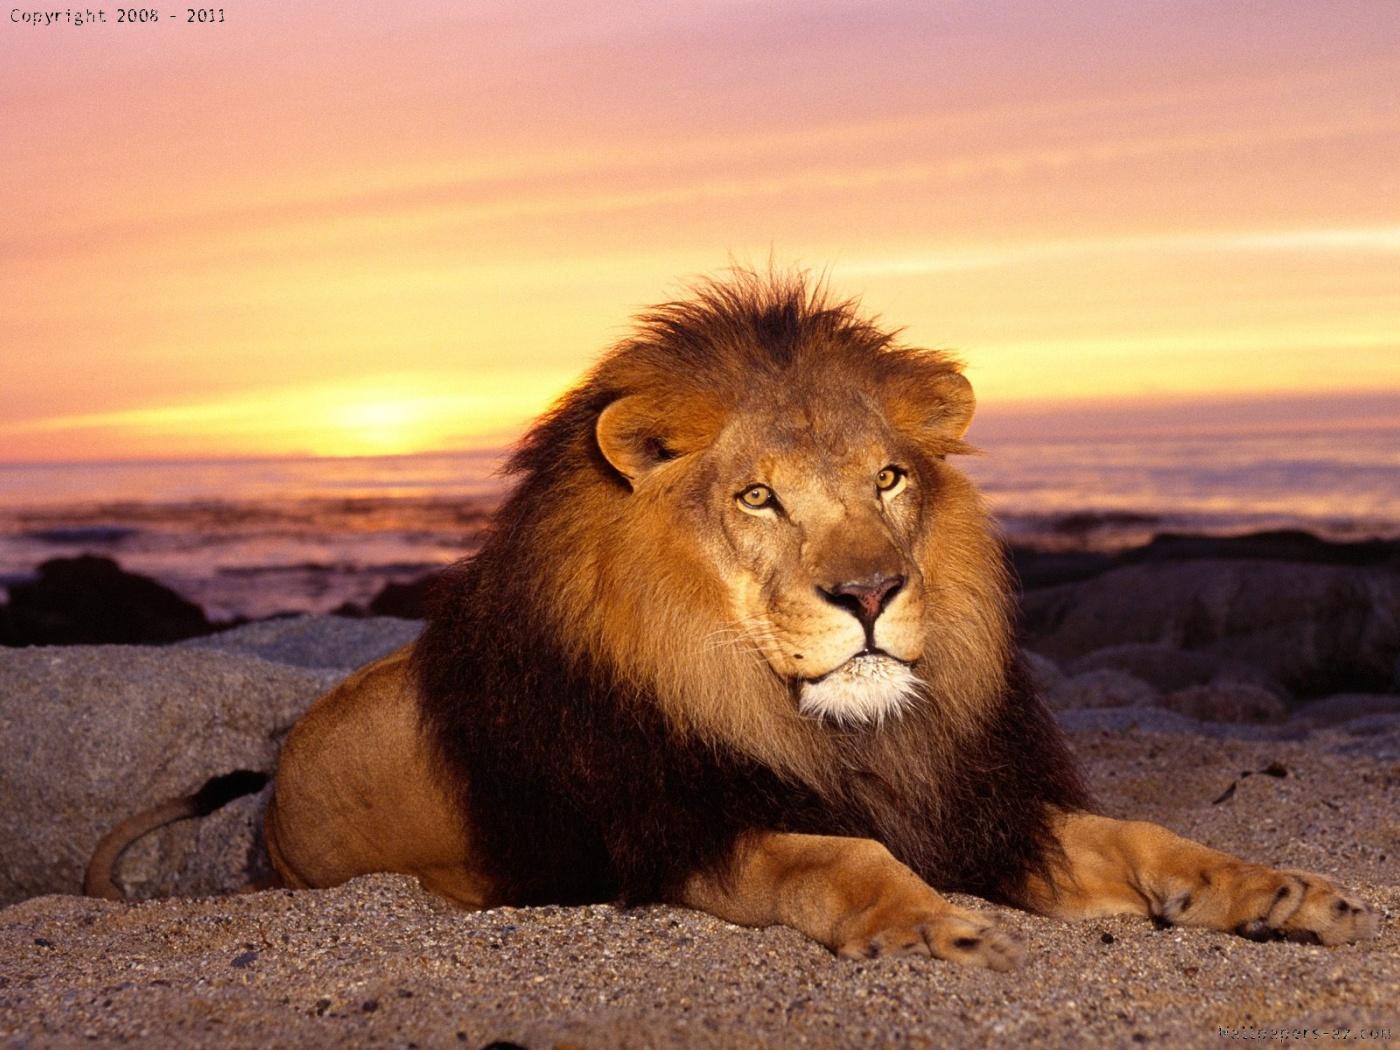 http://4.bp.blogspot.com/-WM_Bra2MMcg/TmuNG-ePmHI/AAAAAAAABu8/l9iKAbkR-kQ/s1600/lion%2Bsea.jpg